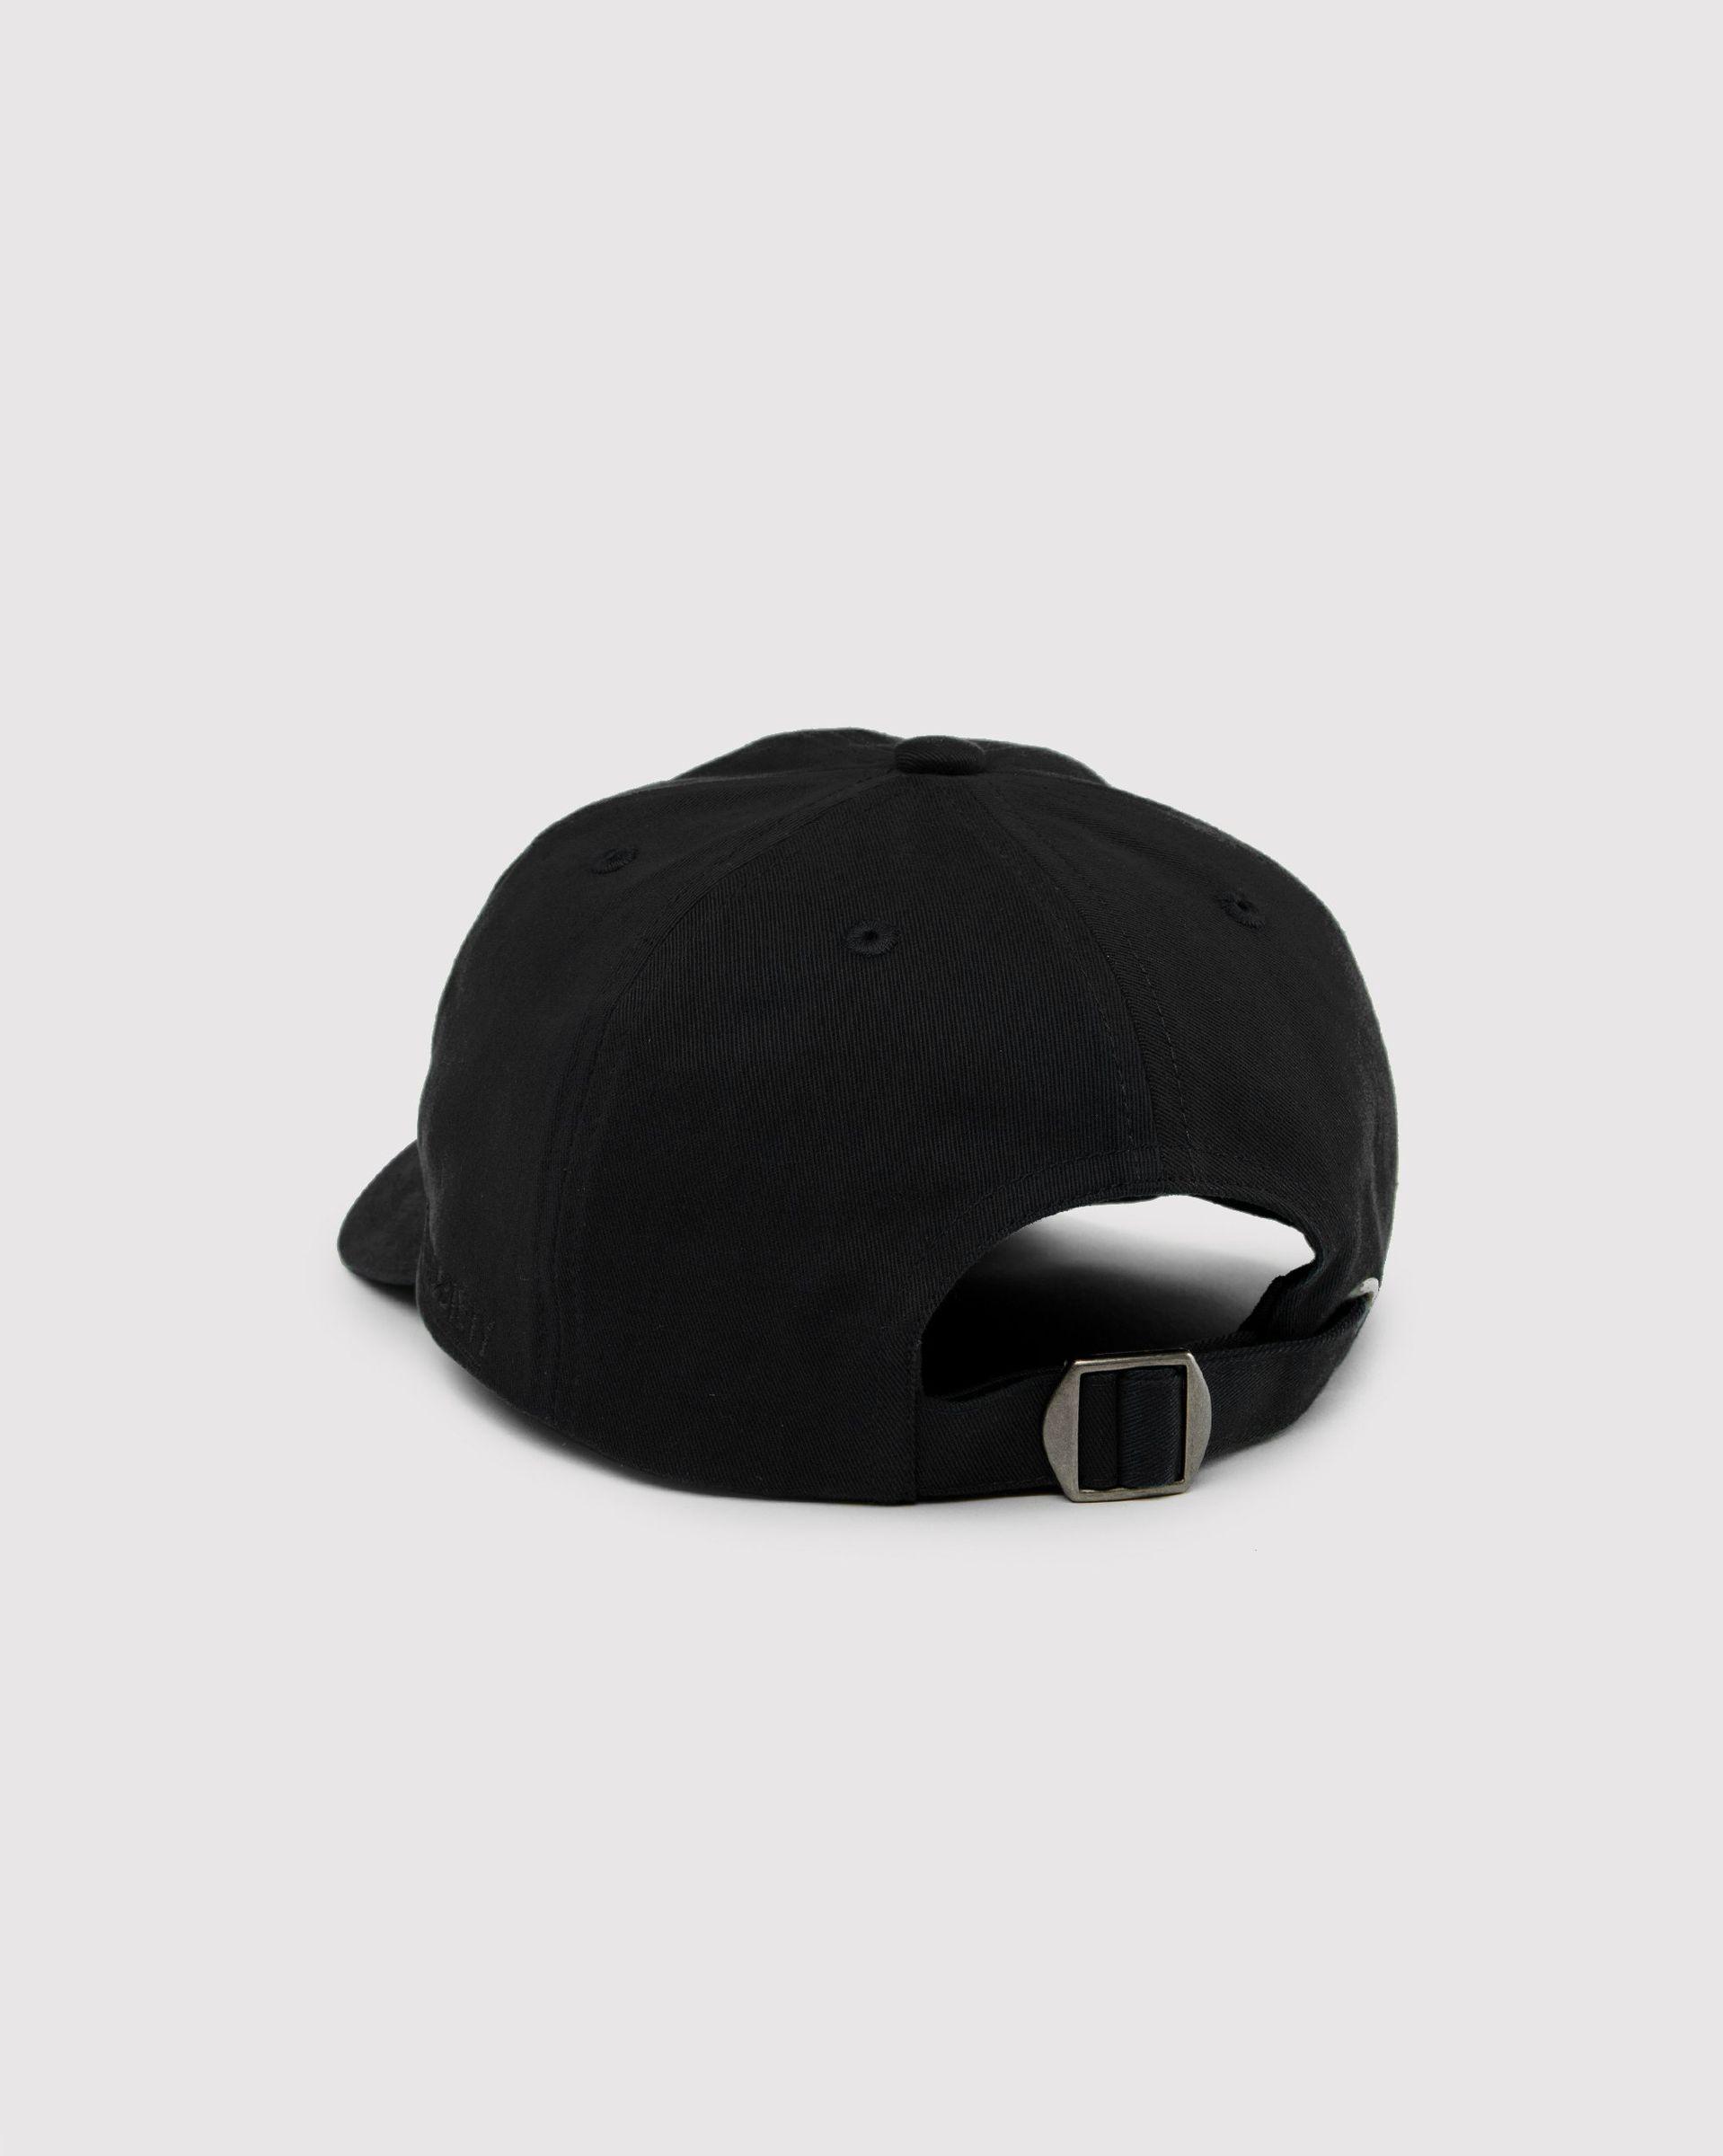 Highsnobiety Staples - Cap Black - Image 2